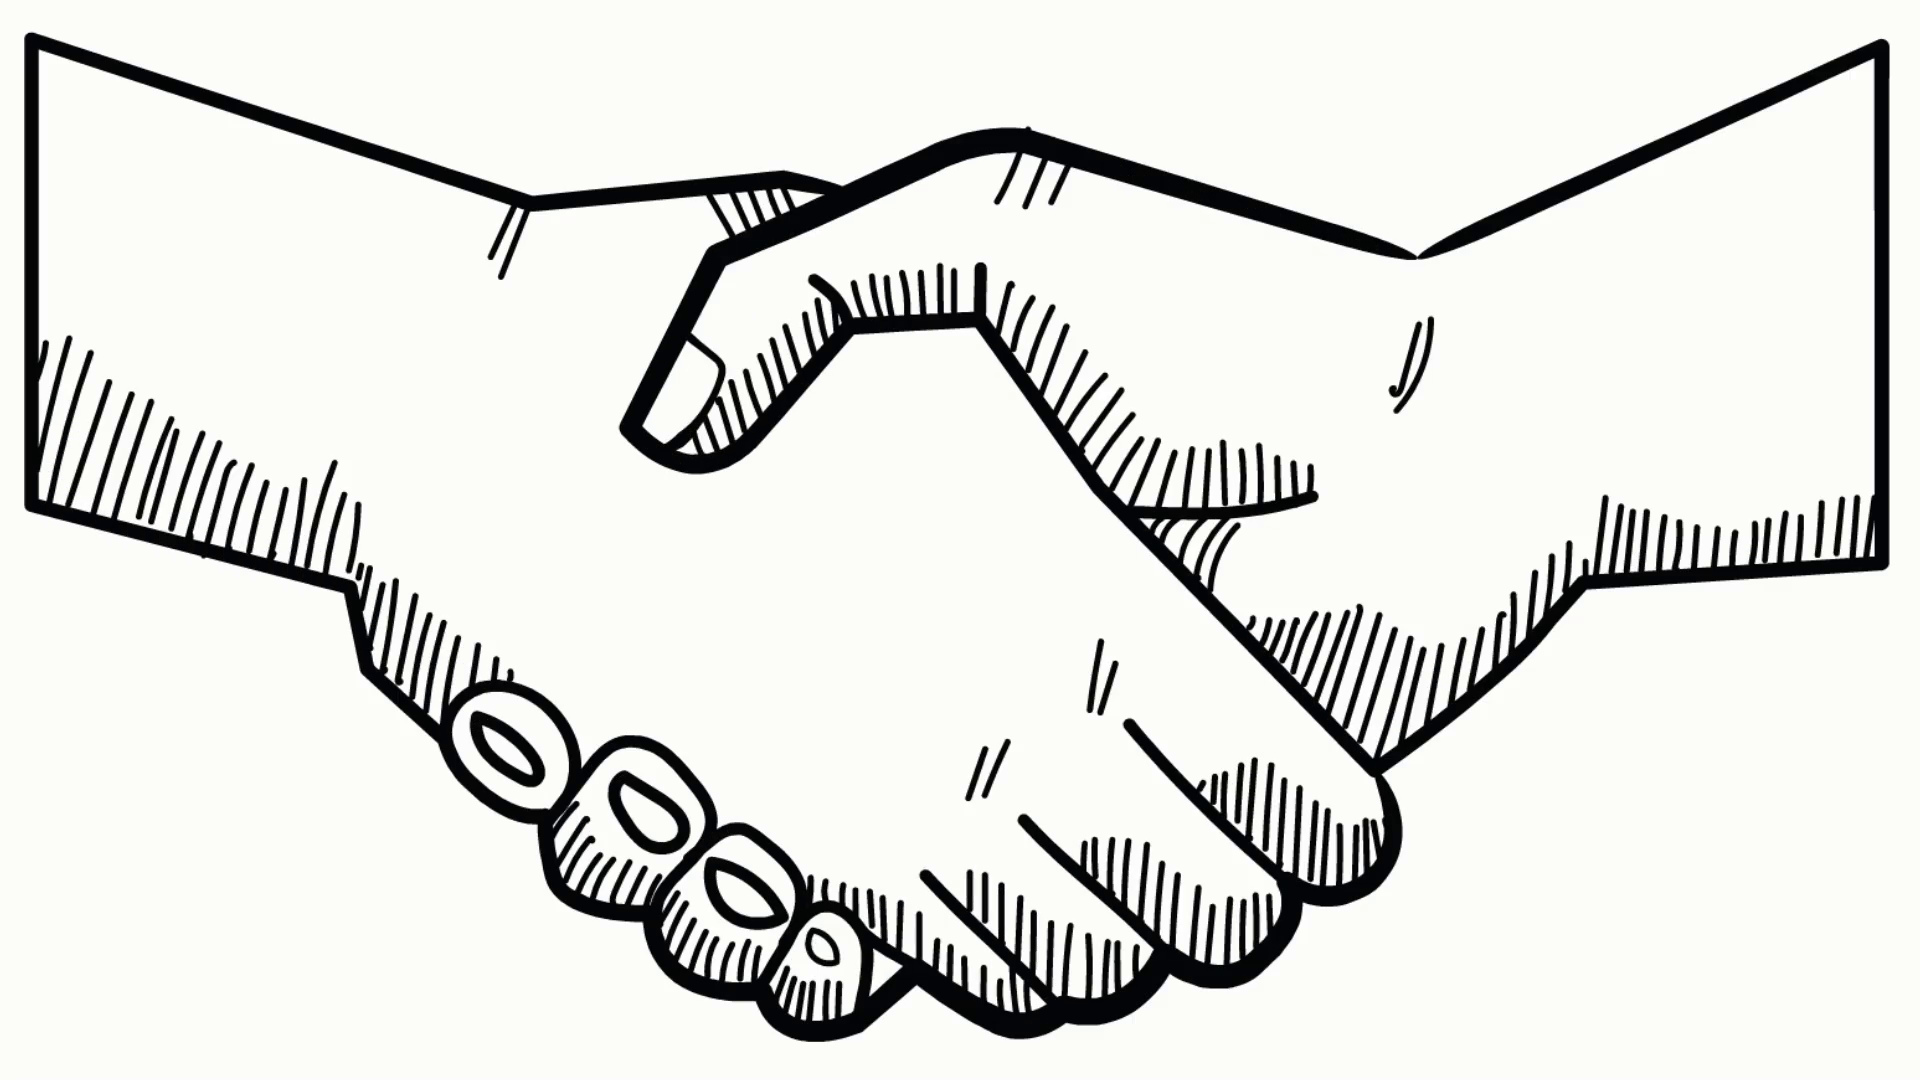 jpg library stock Hand shake drawn icon. Handshake clipart transparent background